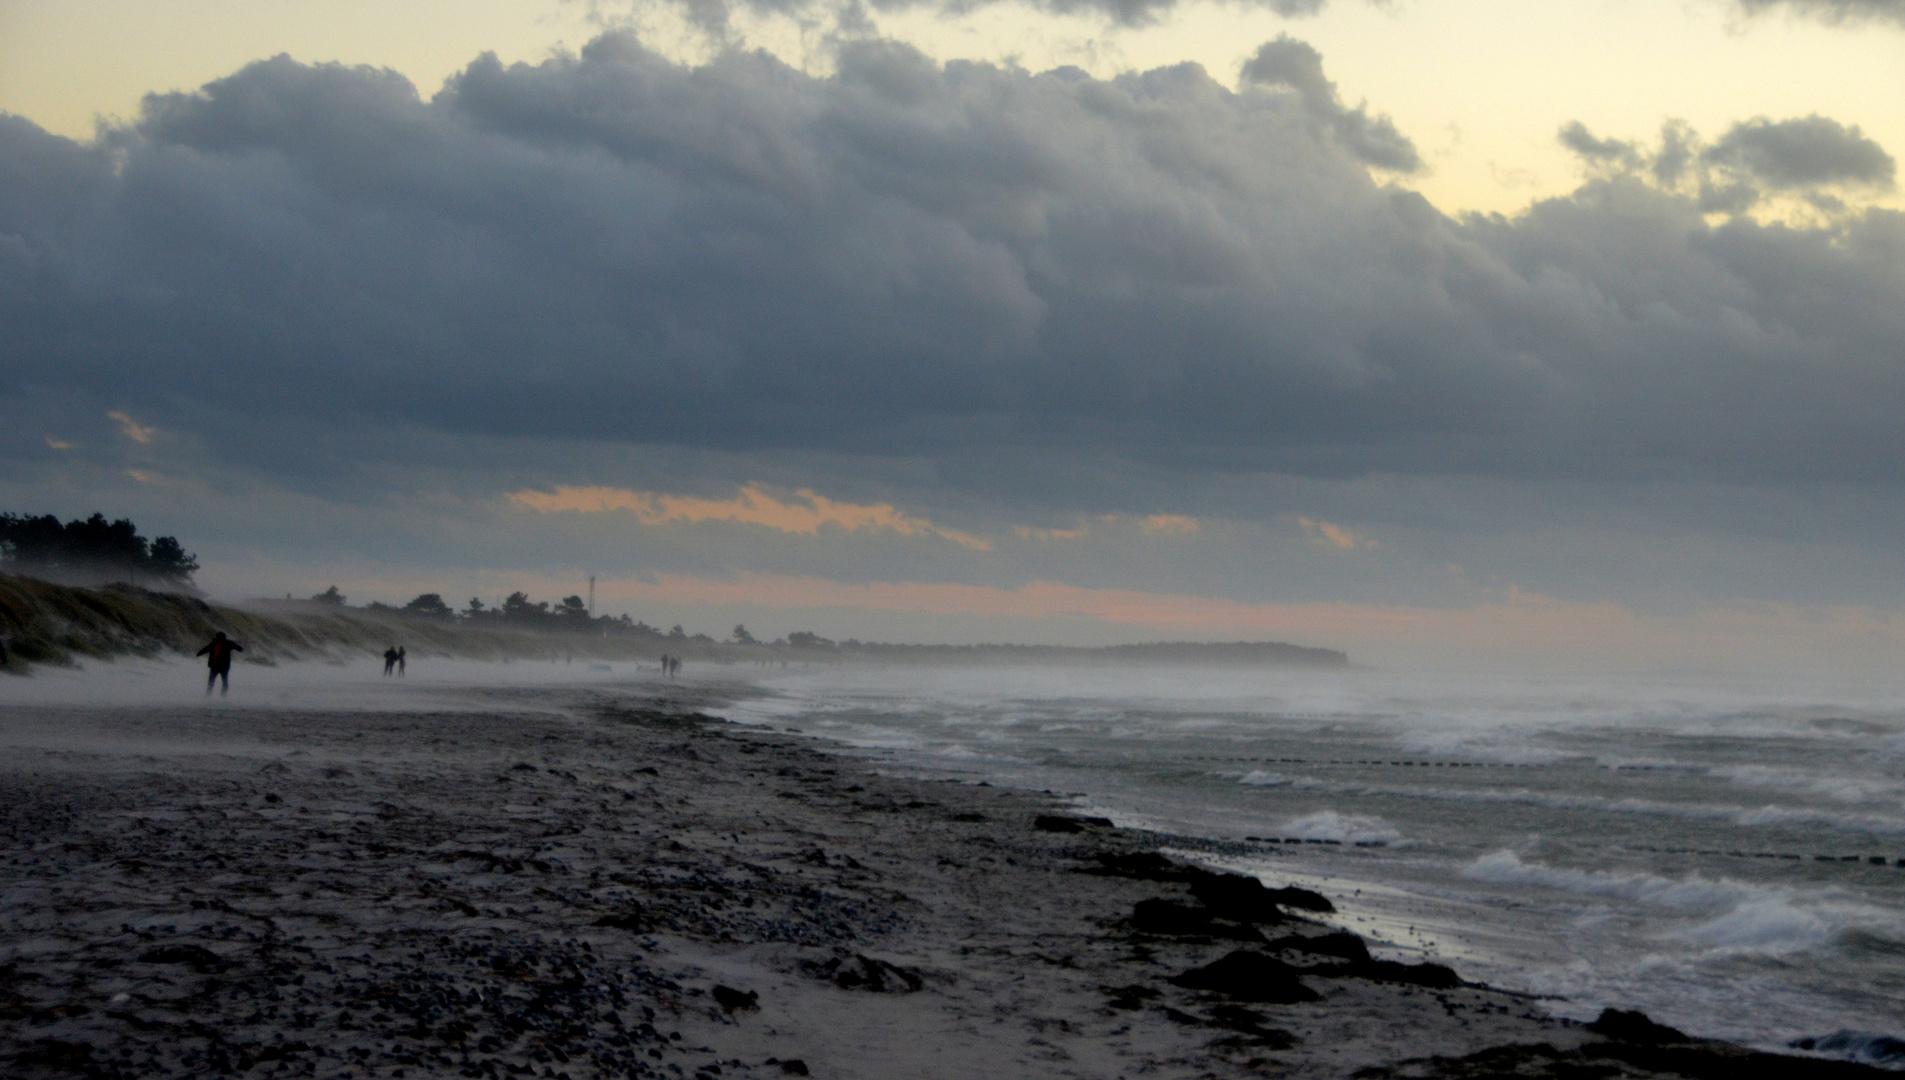 Orkan an der Ostsee